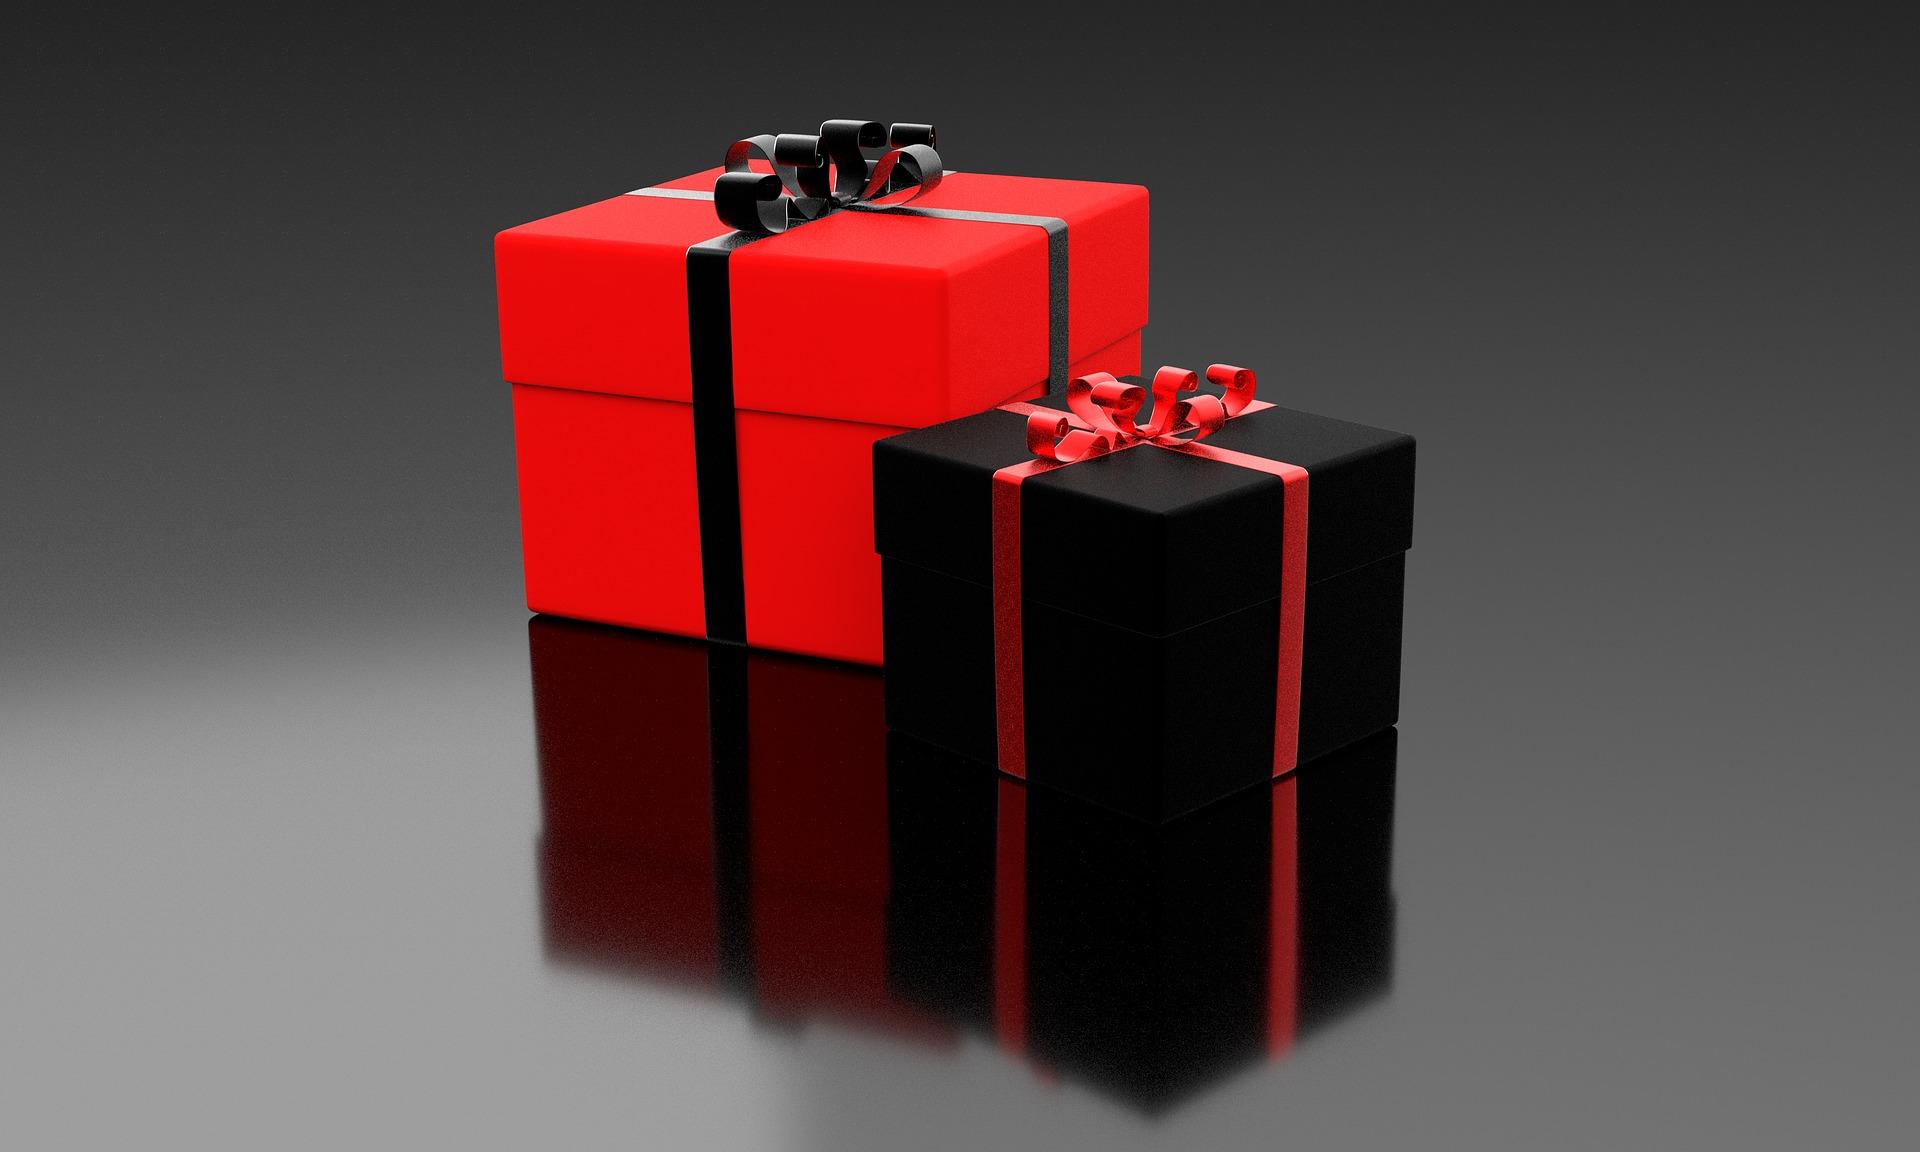 Picture of presents via Pixabay